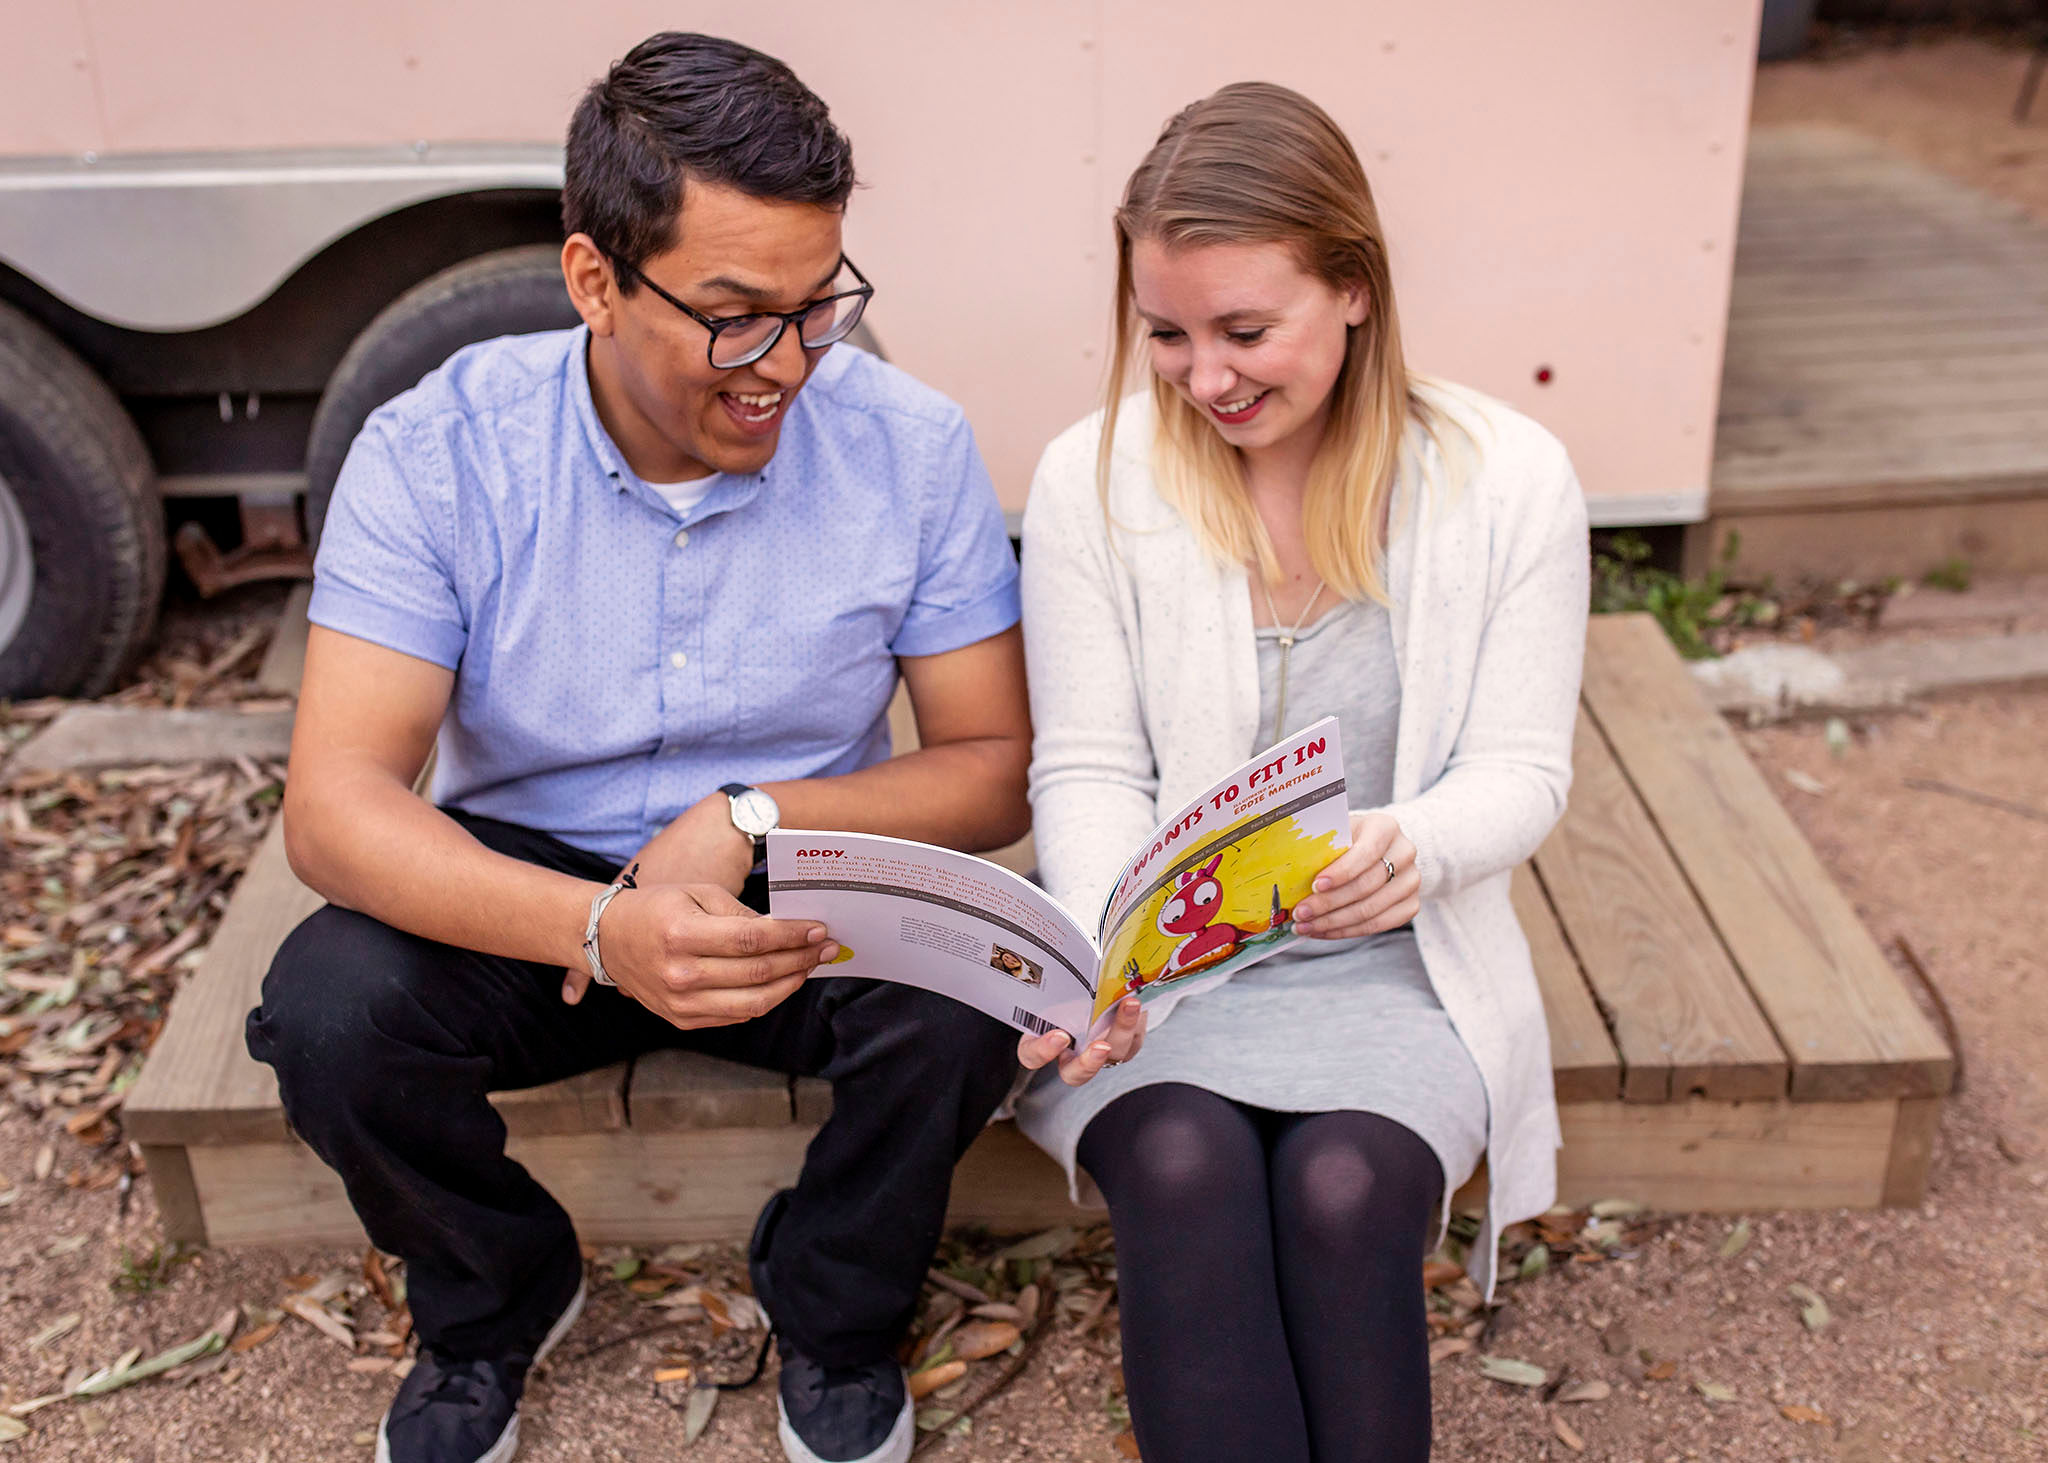 Eddie Martinez, Illustrator + Jacky Lamenzo, Author. Photo by MA BELLE Photography